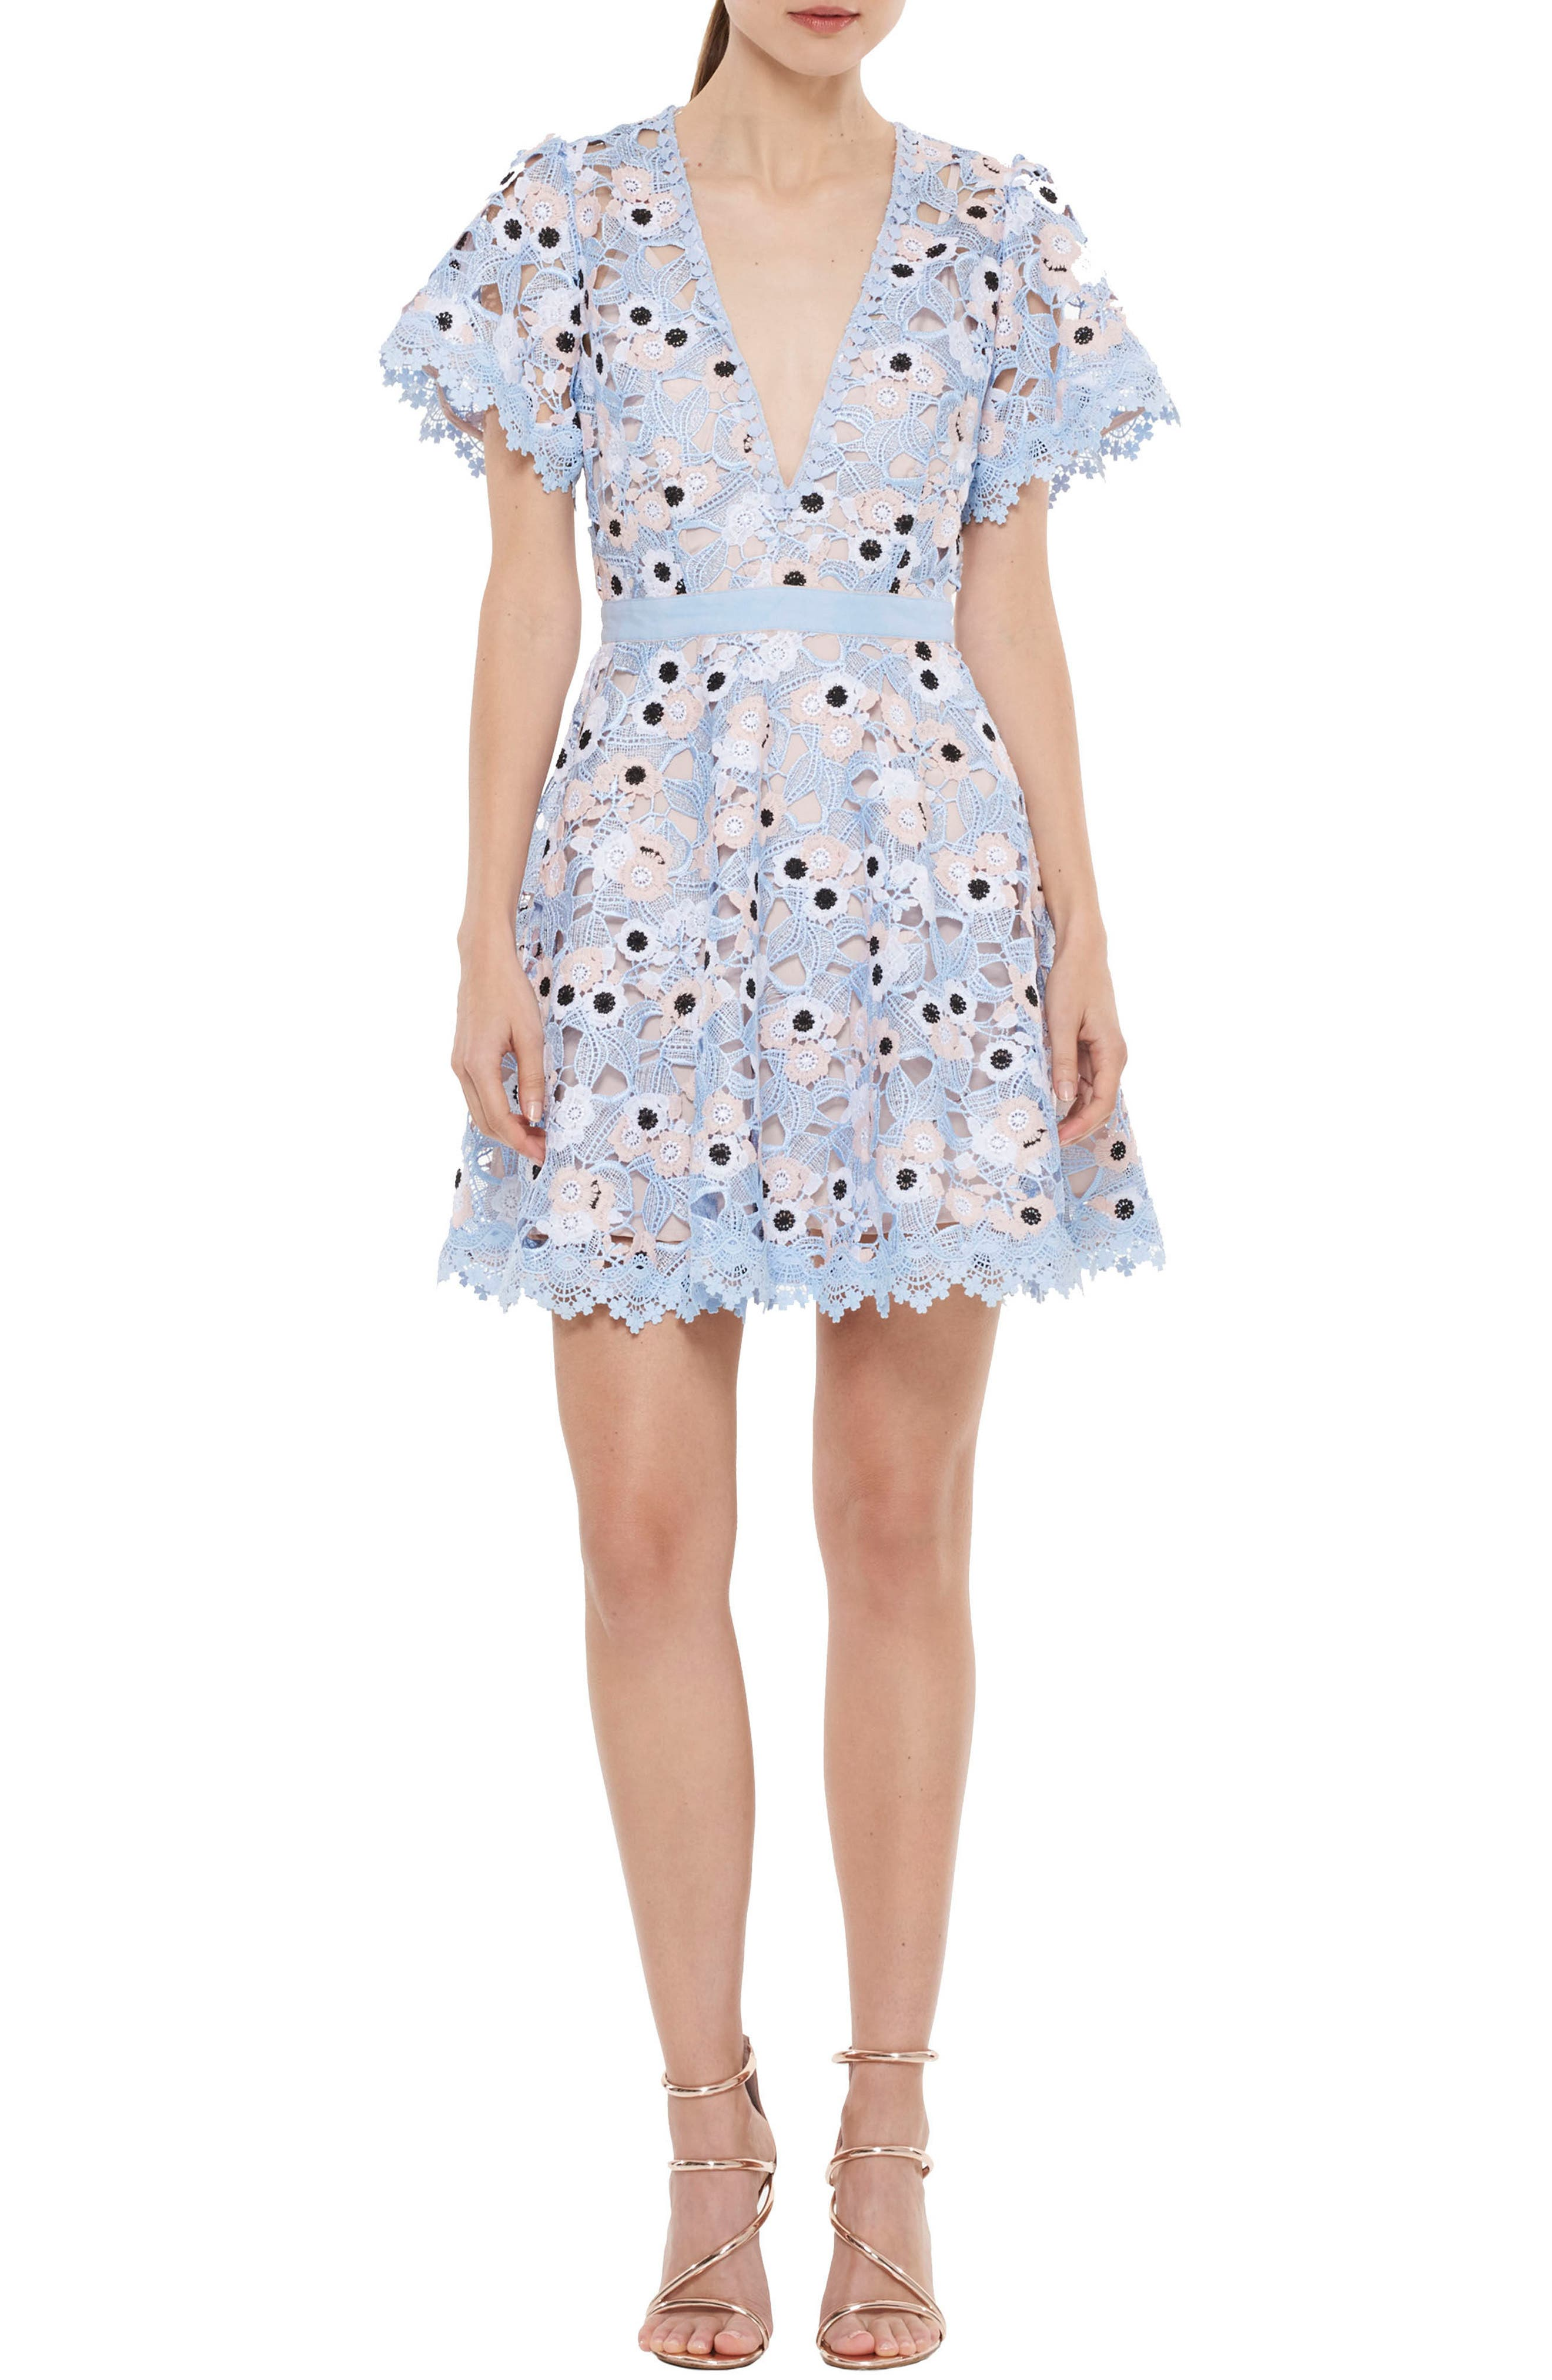 Alternate Image 1 Selected - LA MAISON TALULAH Infatuation Crochet Dress